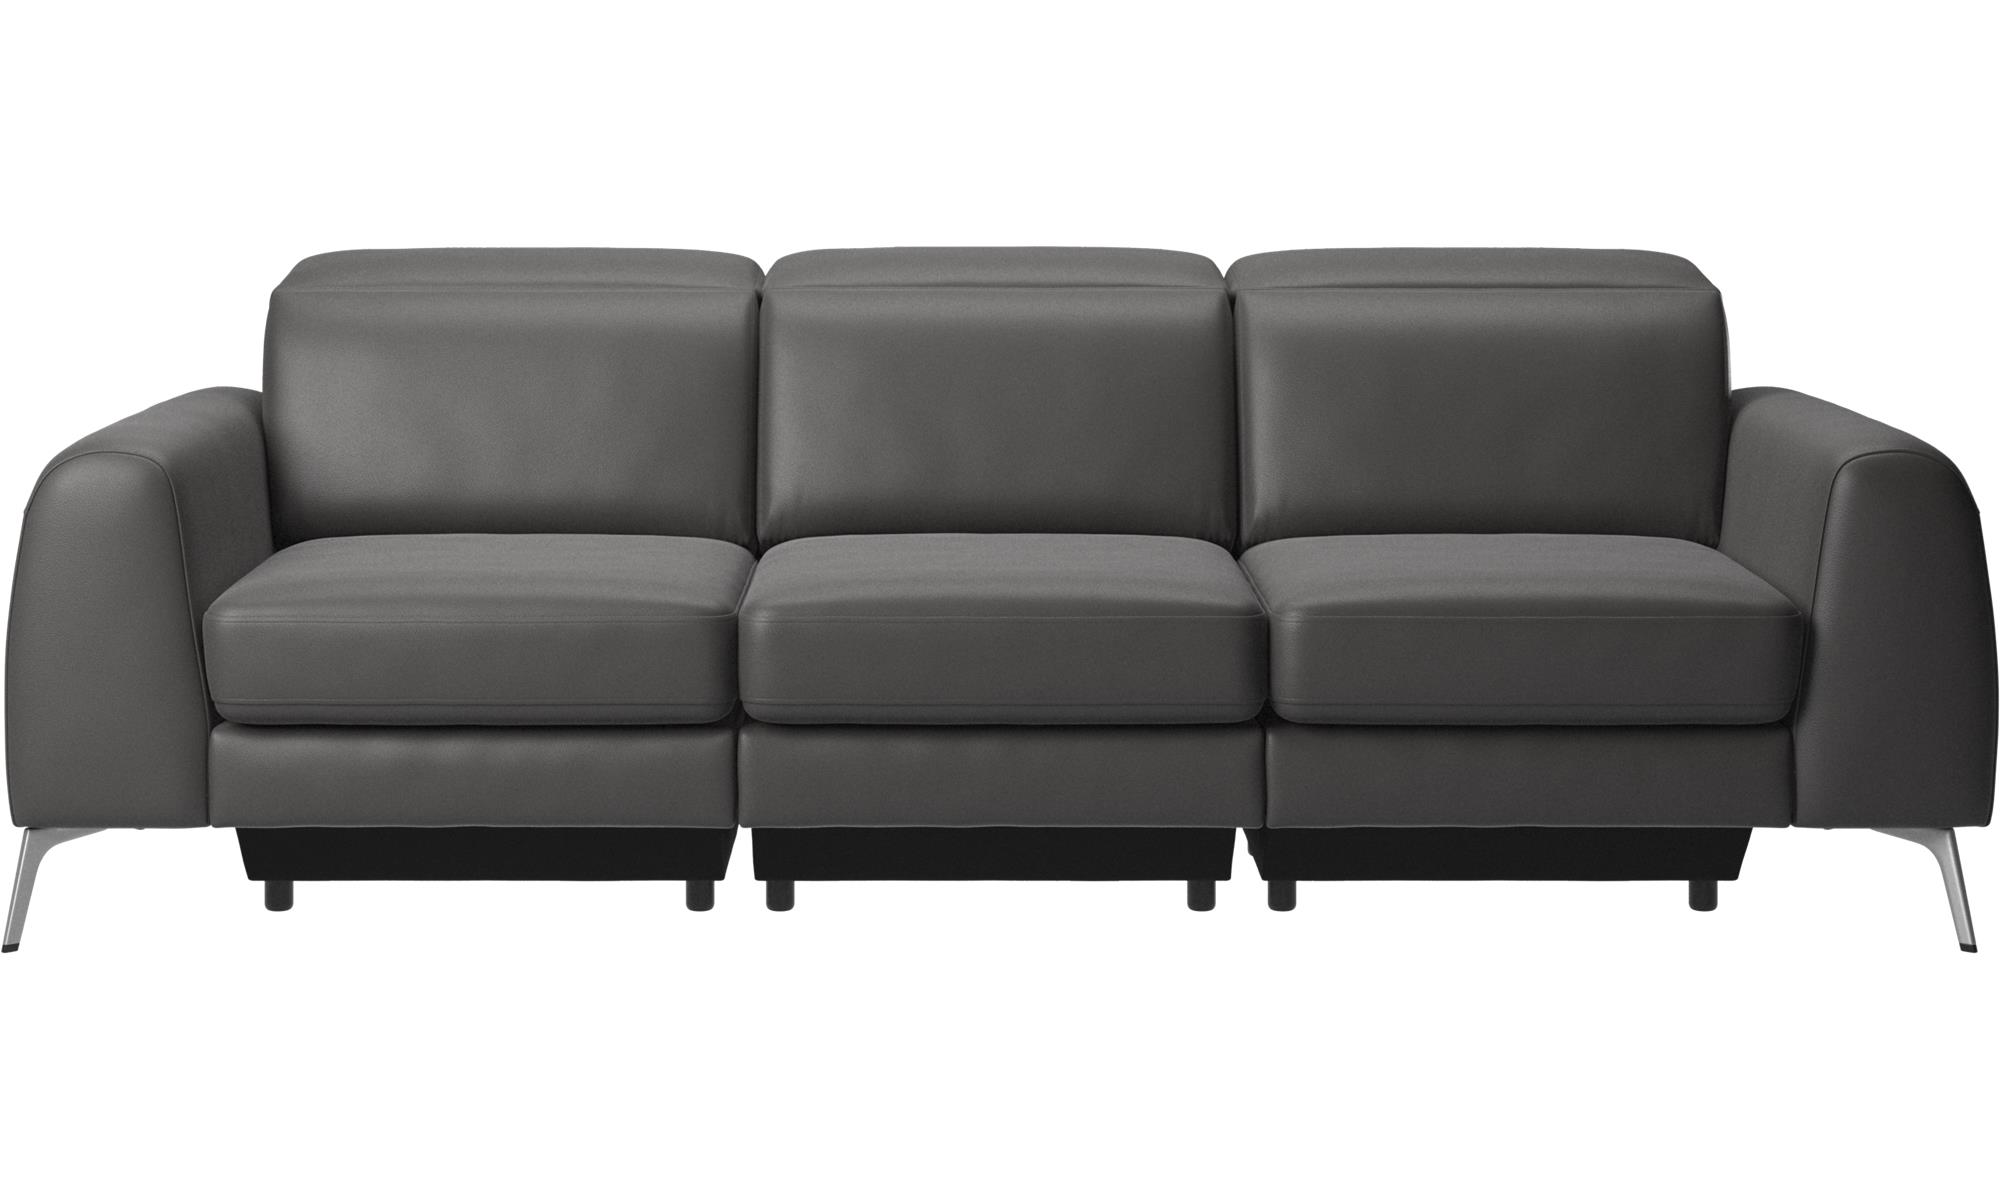 3 sitzer sofas madison sofa mit verstellbarer kopfst tze. Black Bedroom Furniture Sets. Home Design Ideas